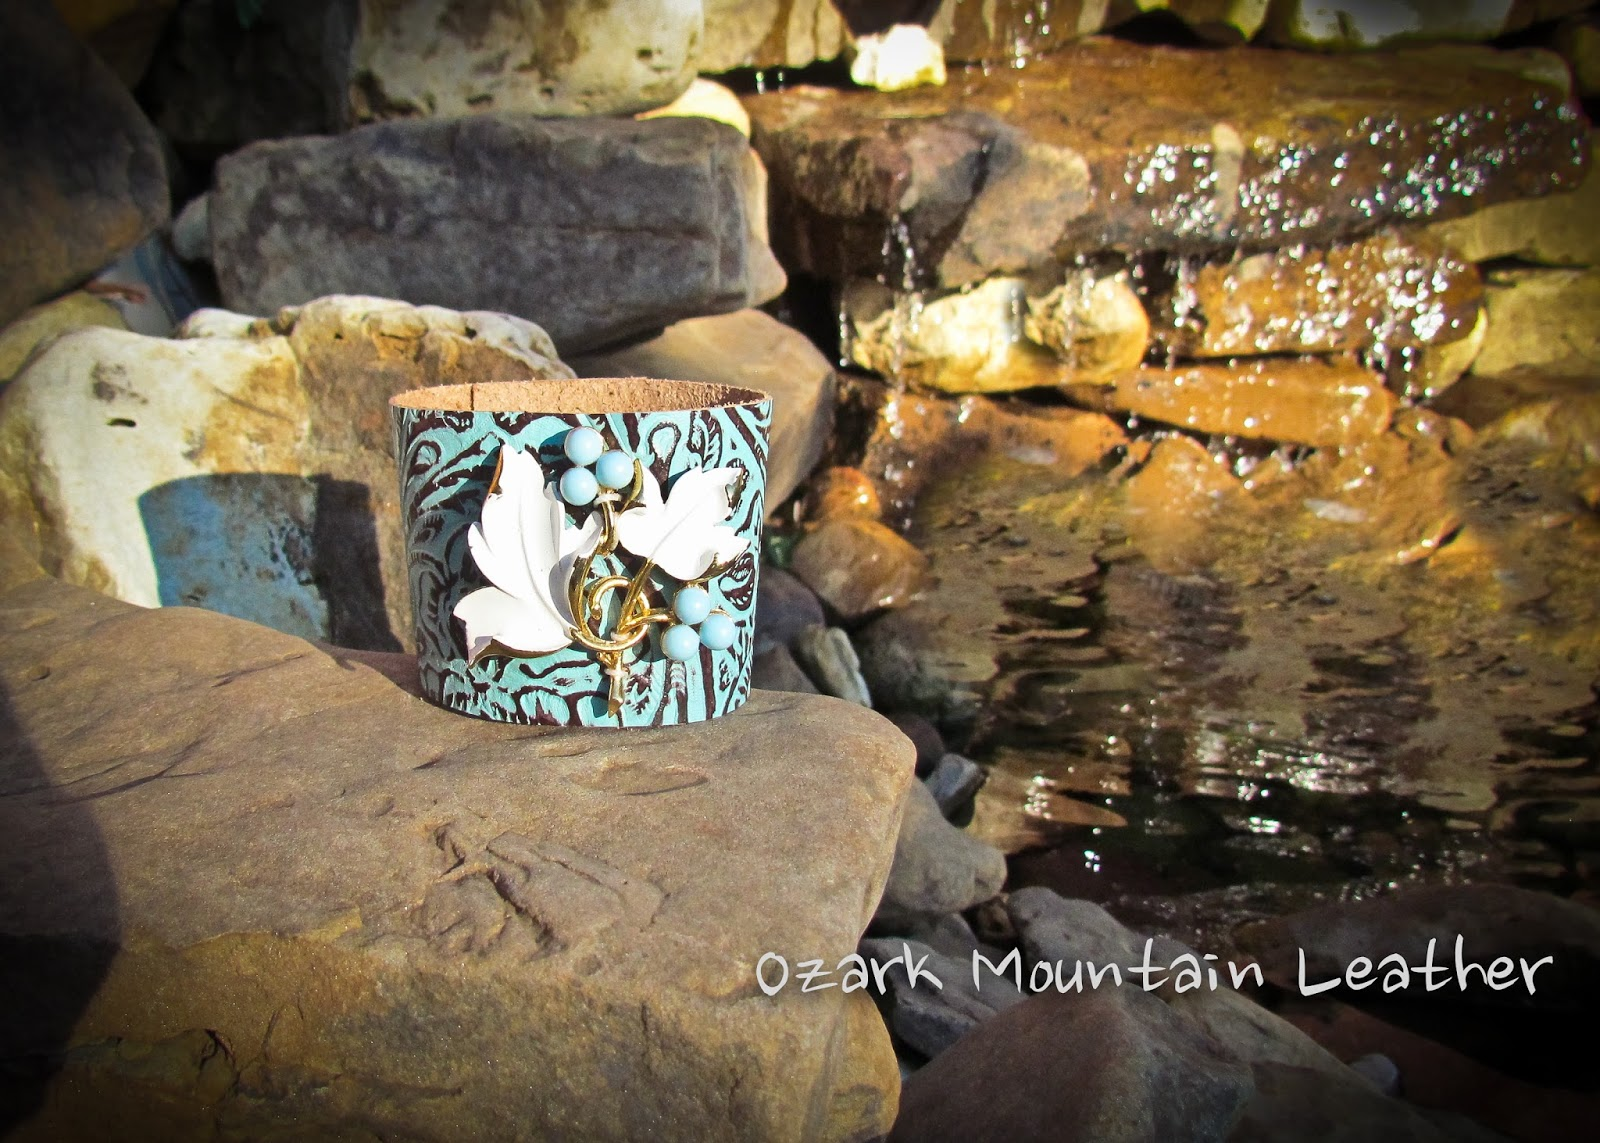 Ozark Mountain Leather Turquoise Anyone